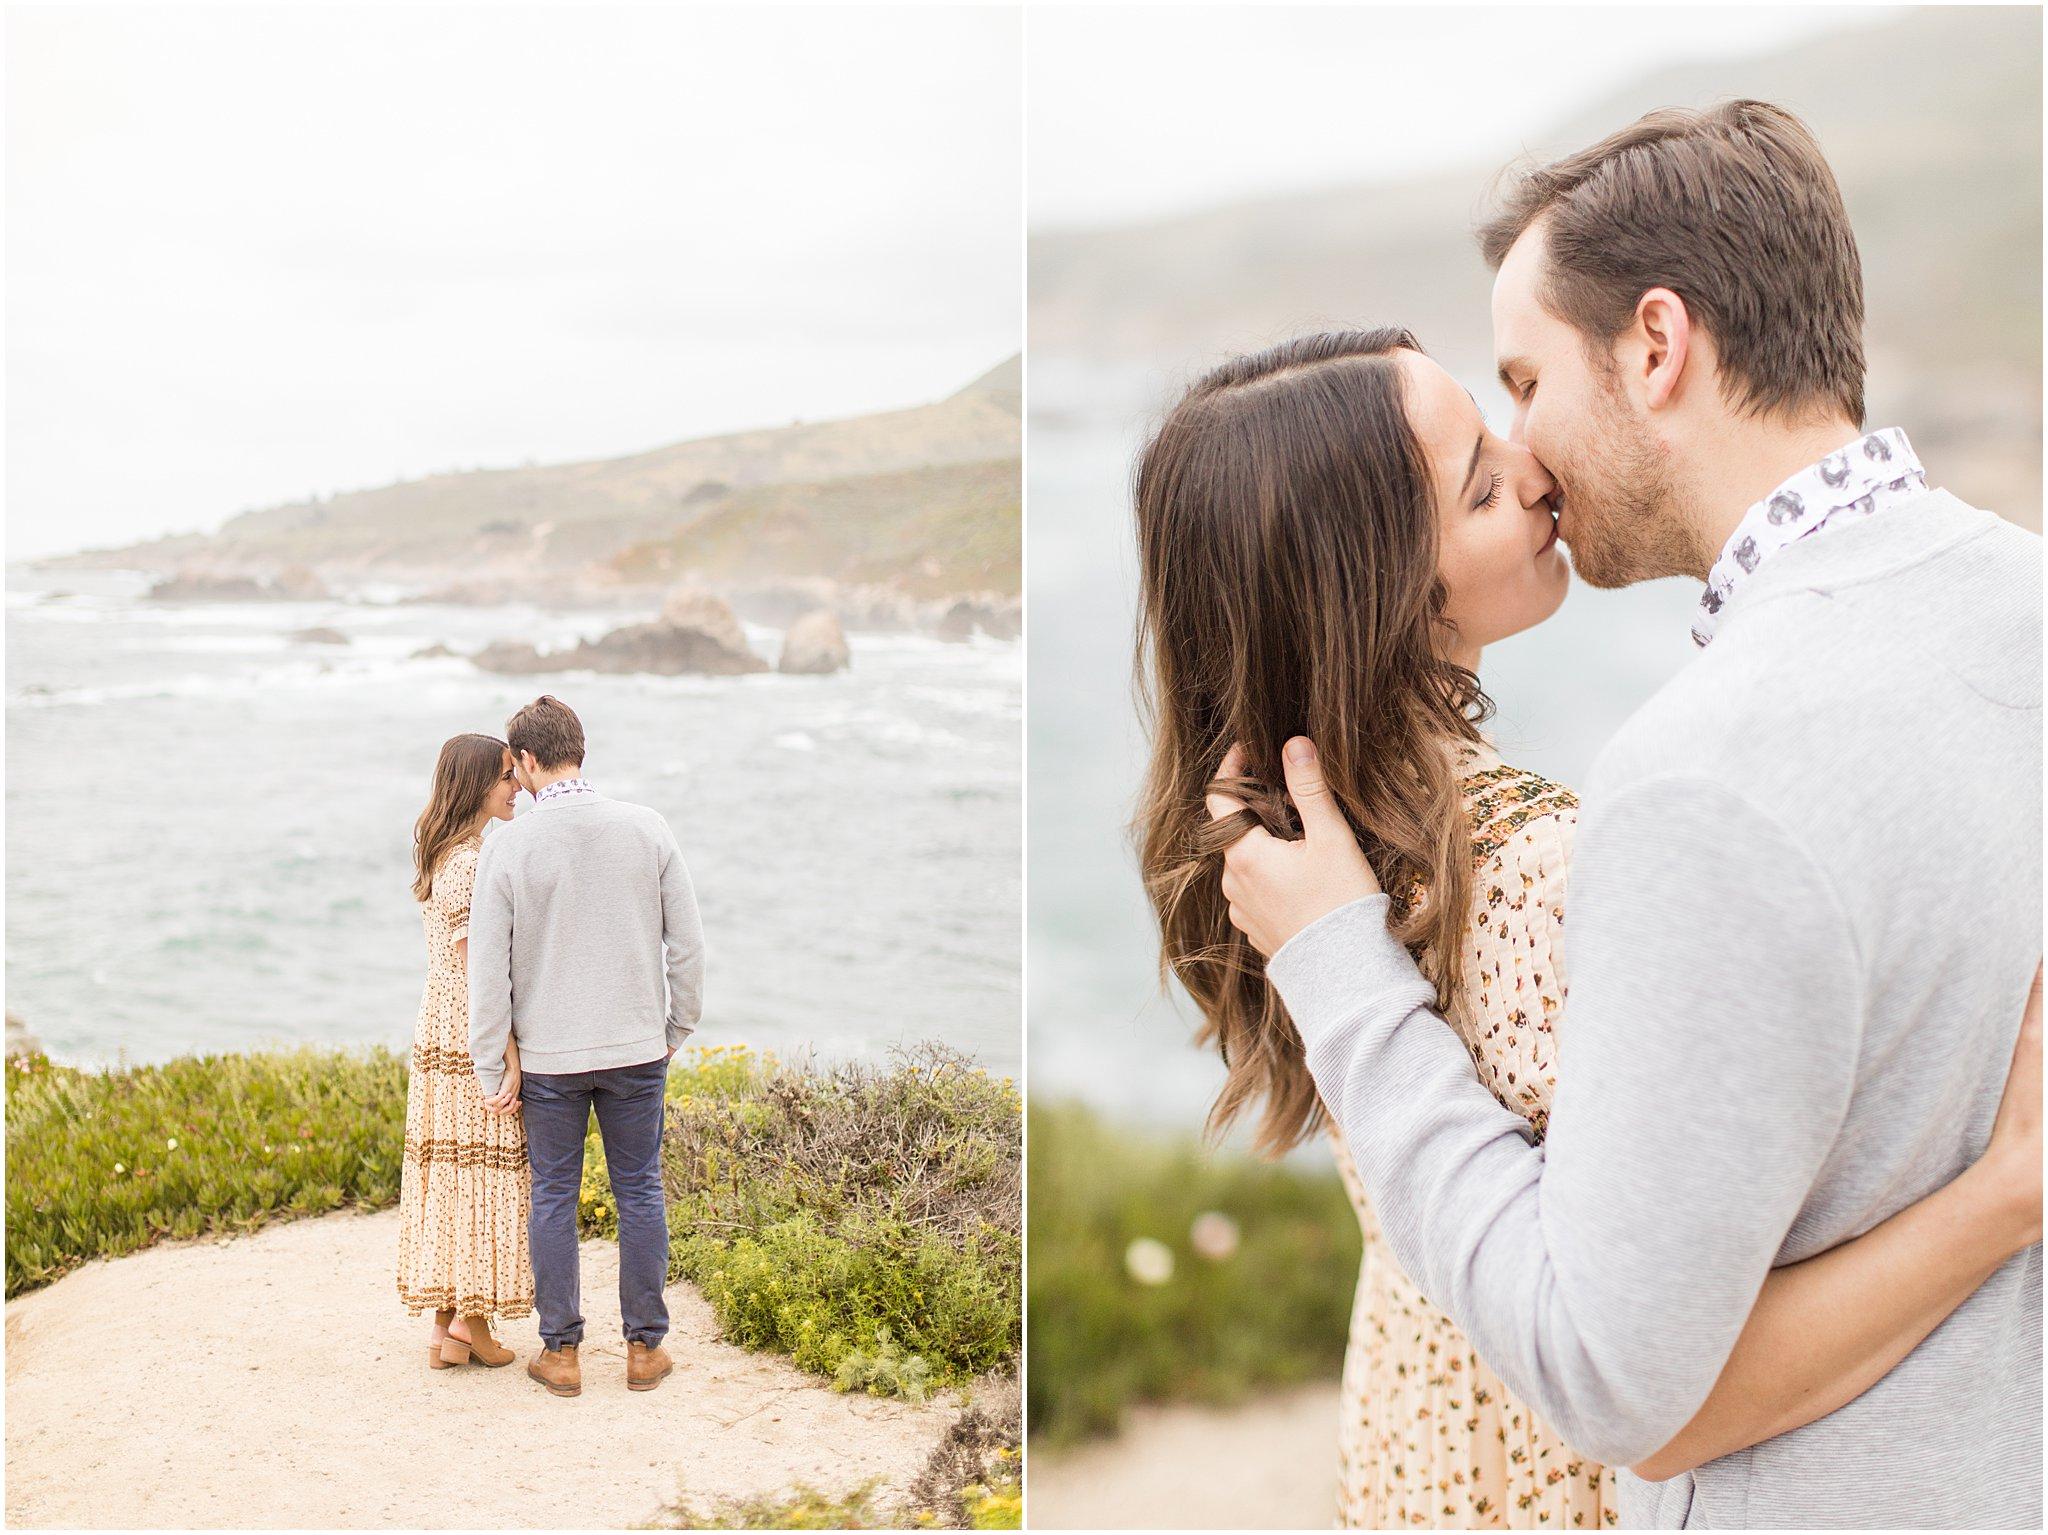 2019 carmel highlands garrapata state park couples portrait session bay area wedding photographer_0014.jpg